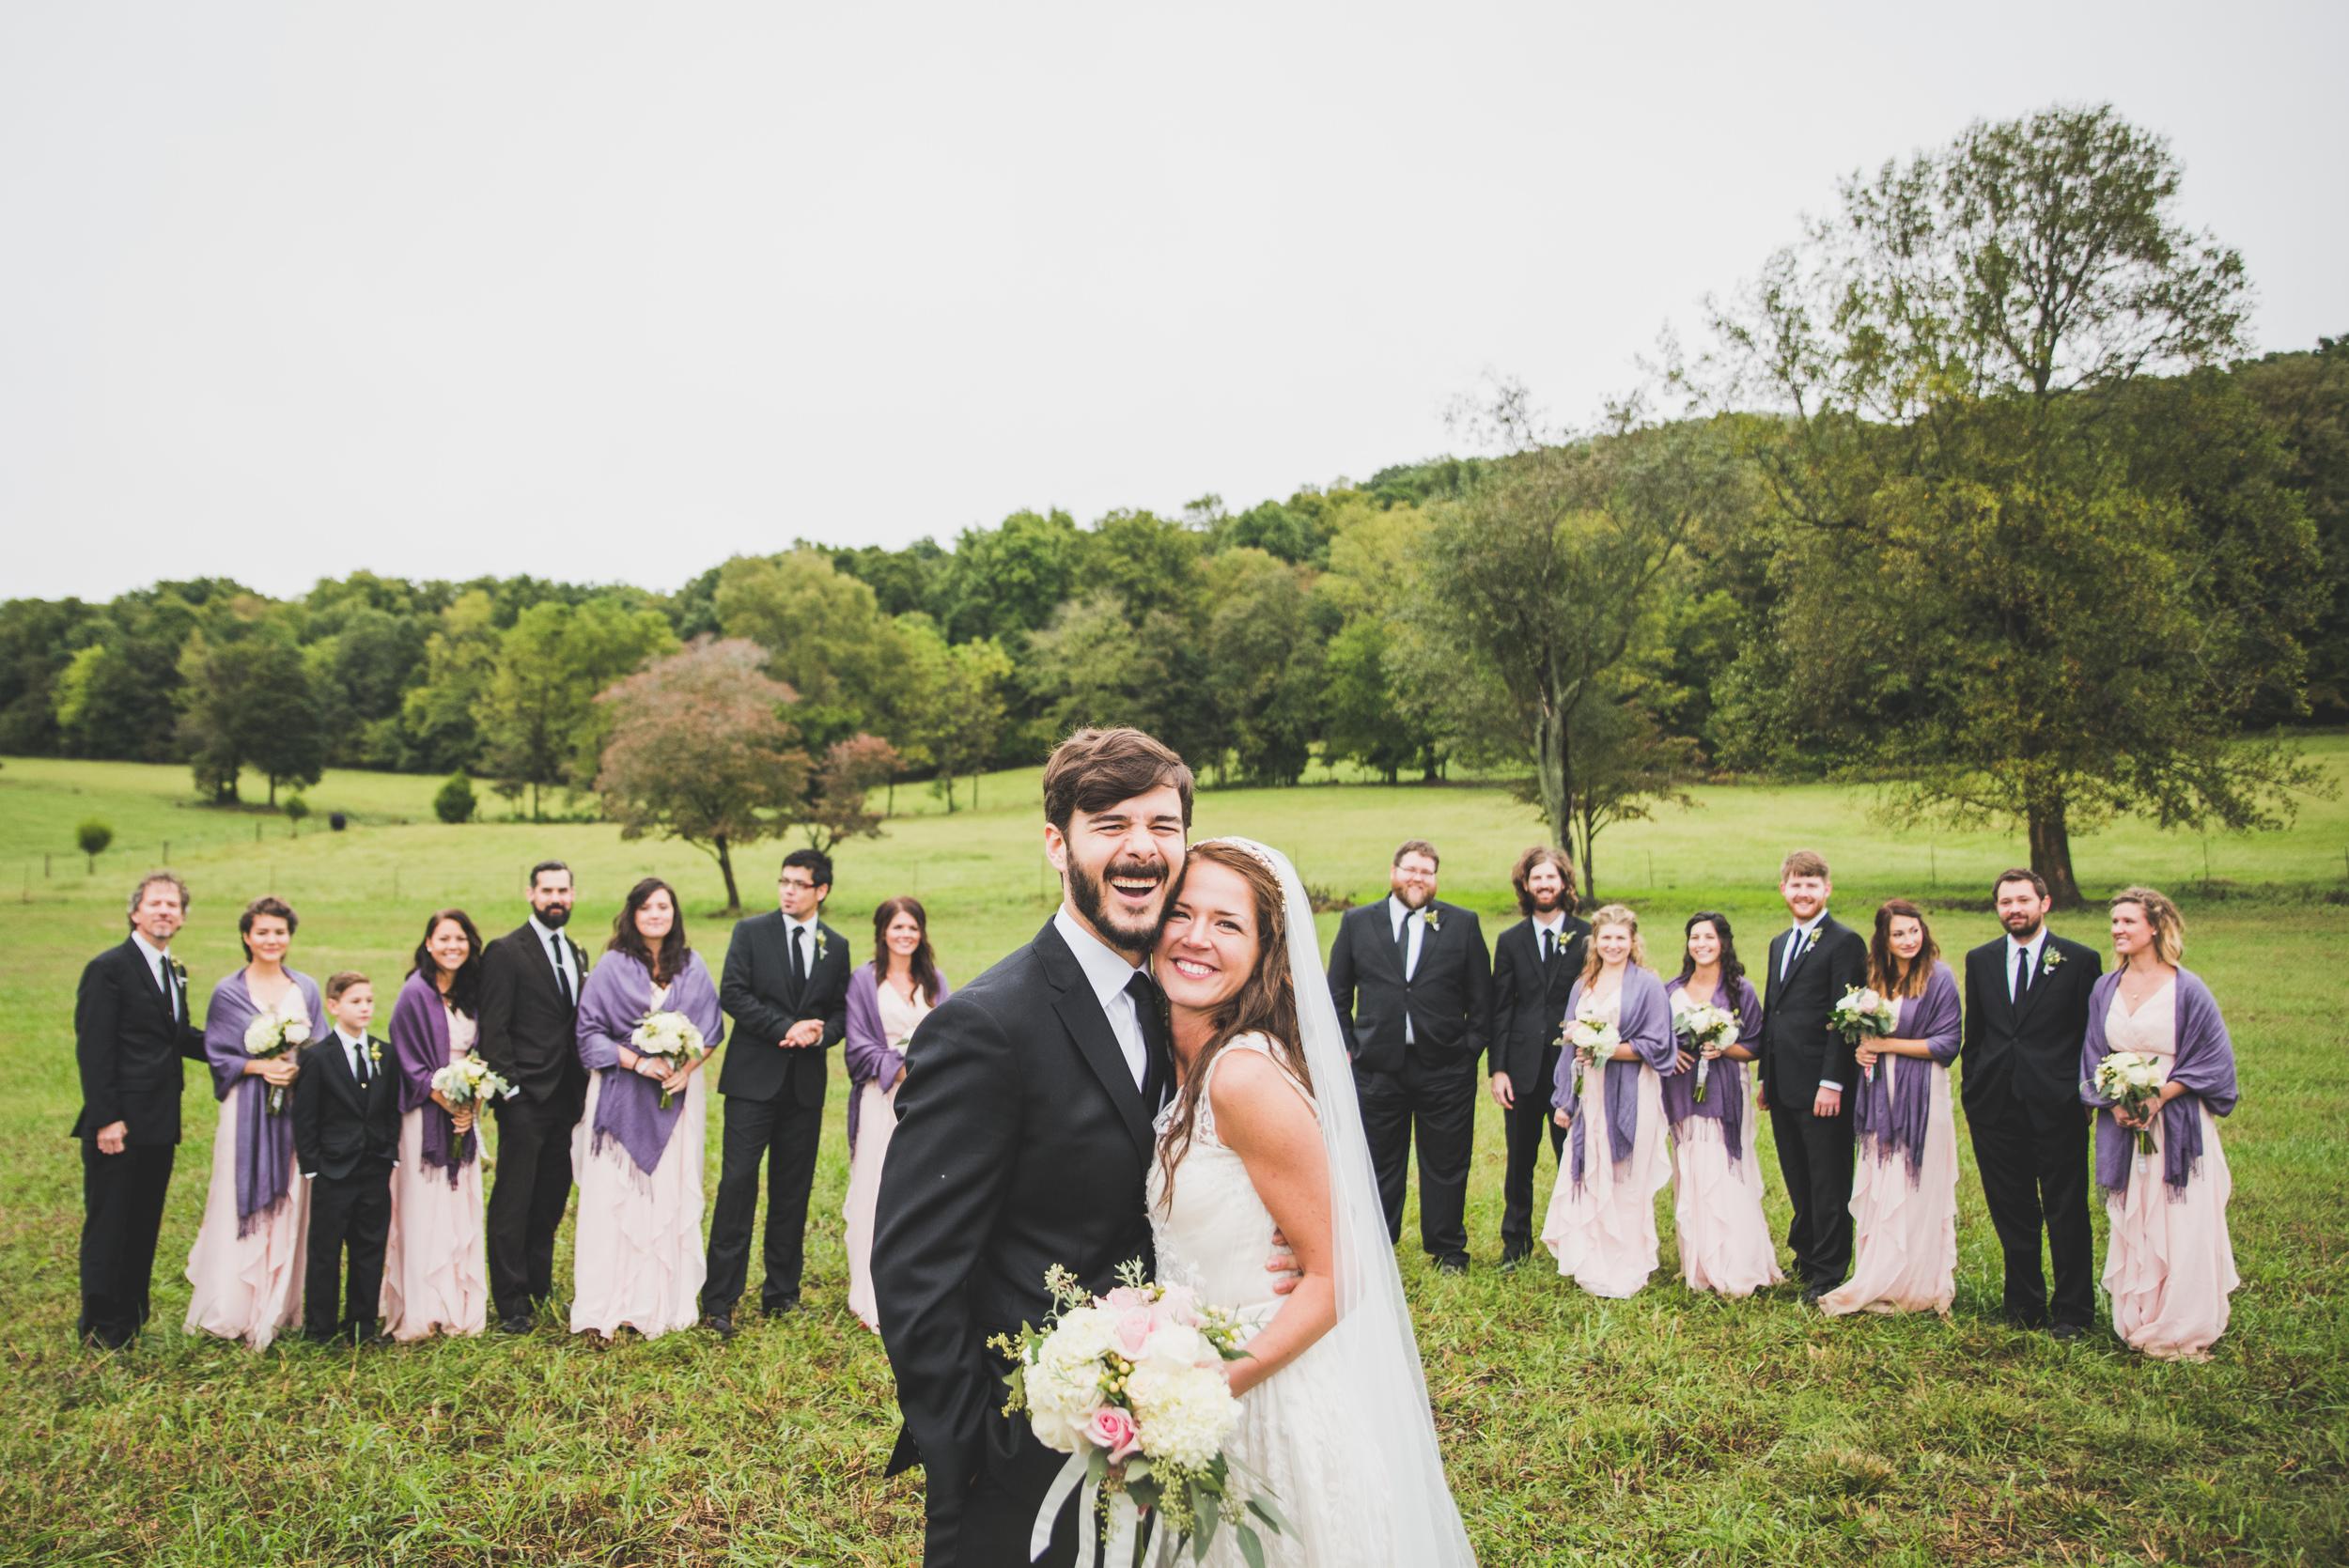 Nashville-Wedding-Photographer-John-Myers-41.jpg